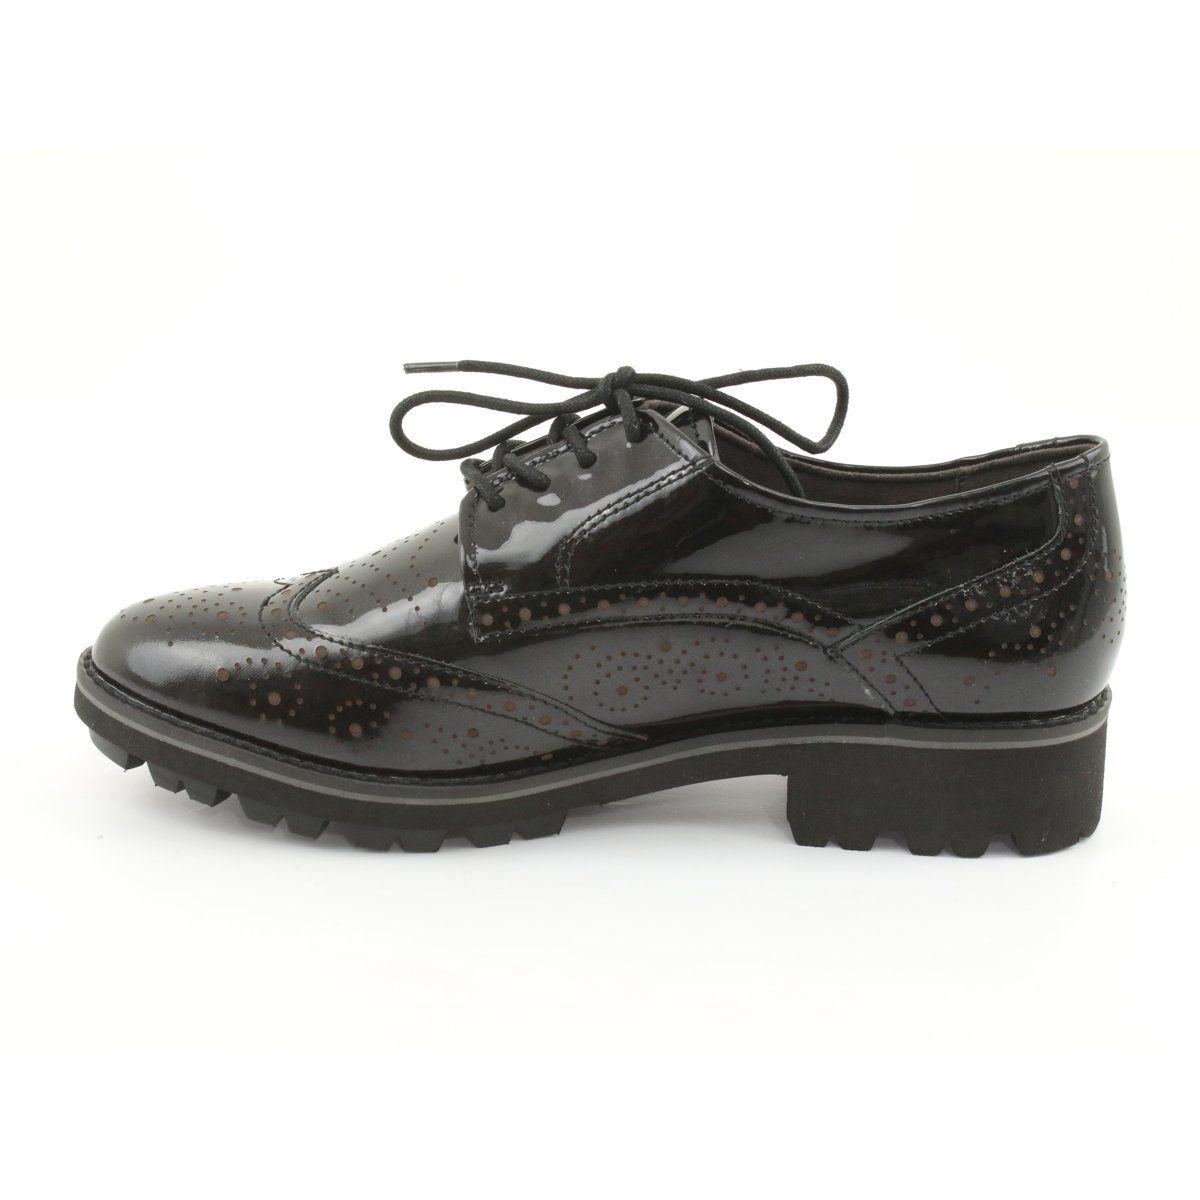 Oksfordki Polbuty Sznurowane Caprice 23701 Czarne Wielokolorowe Women Shoes Oxford Shoes Lace Up Shoes